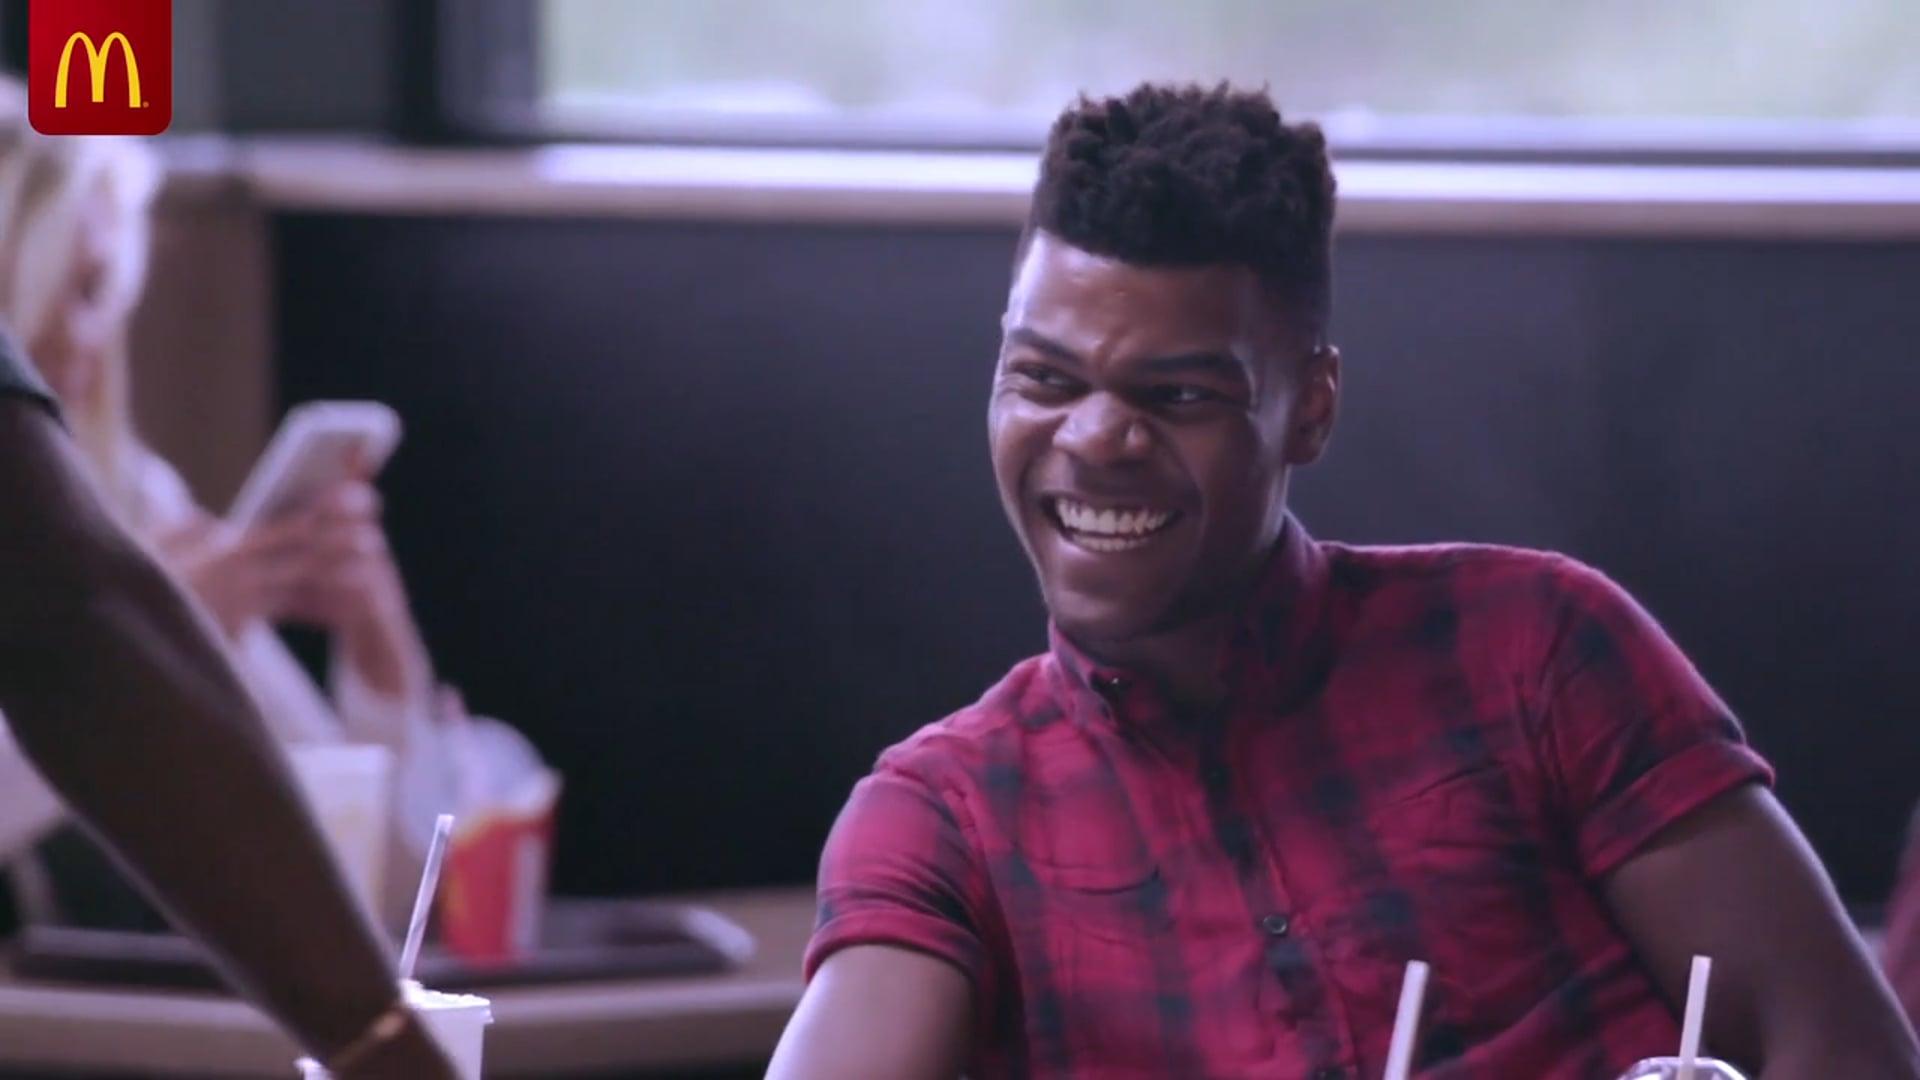 McDonalds Commercial 'GOOD TIMES' Tinie Tempah